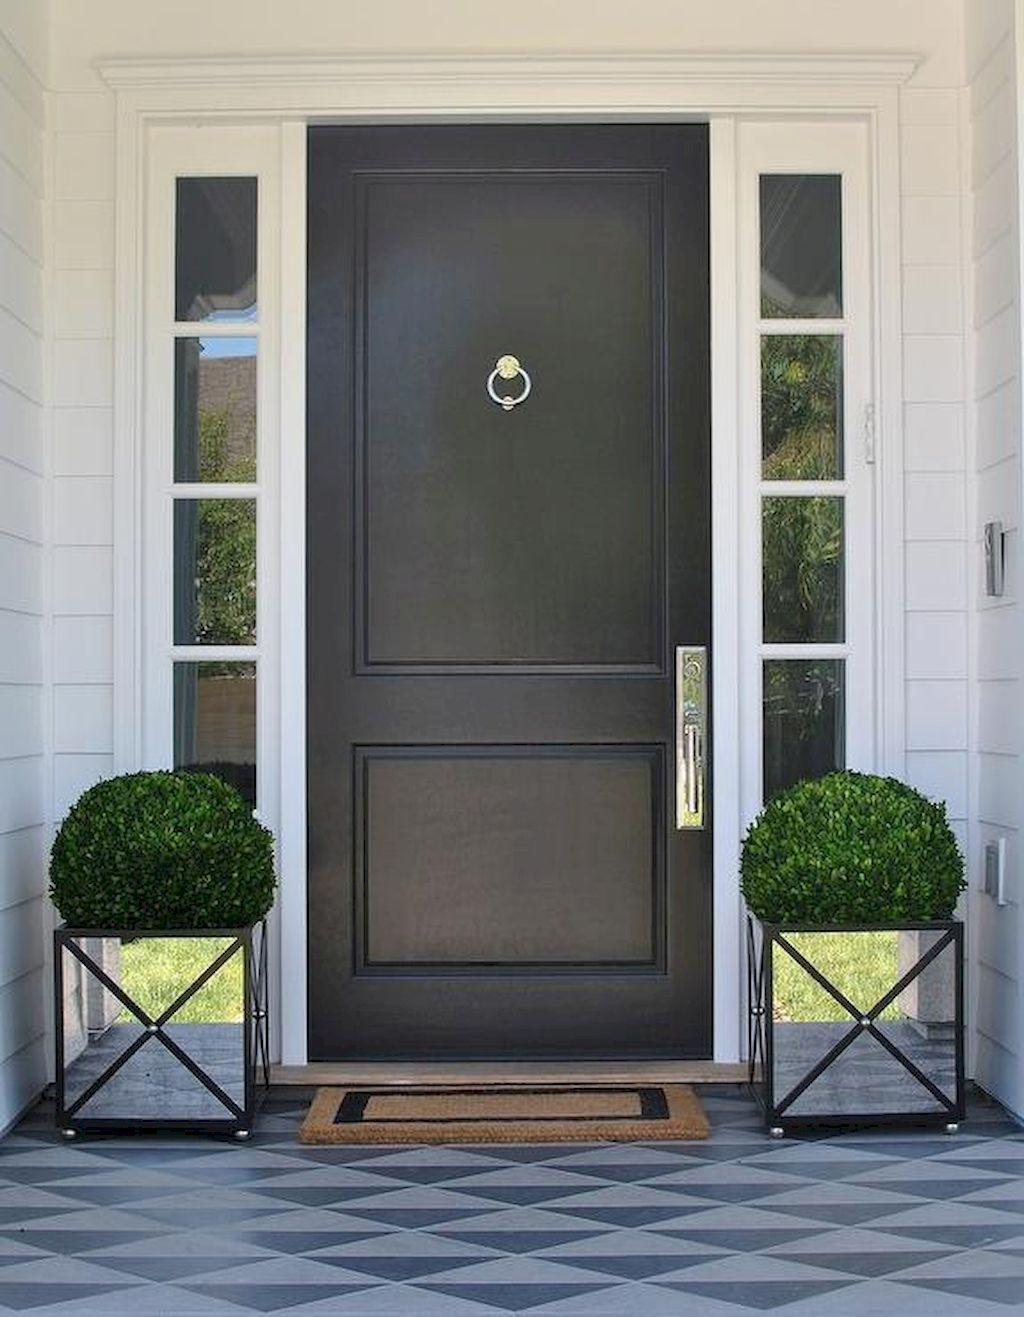 Front door with sidelites m6410 103010 ct 4irh the home depot - 79 Front Entry Doors Design Ideas